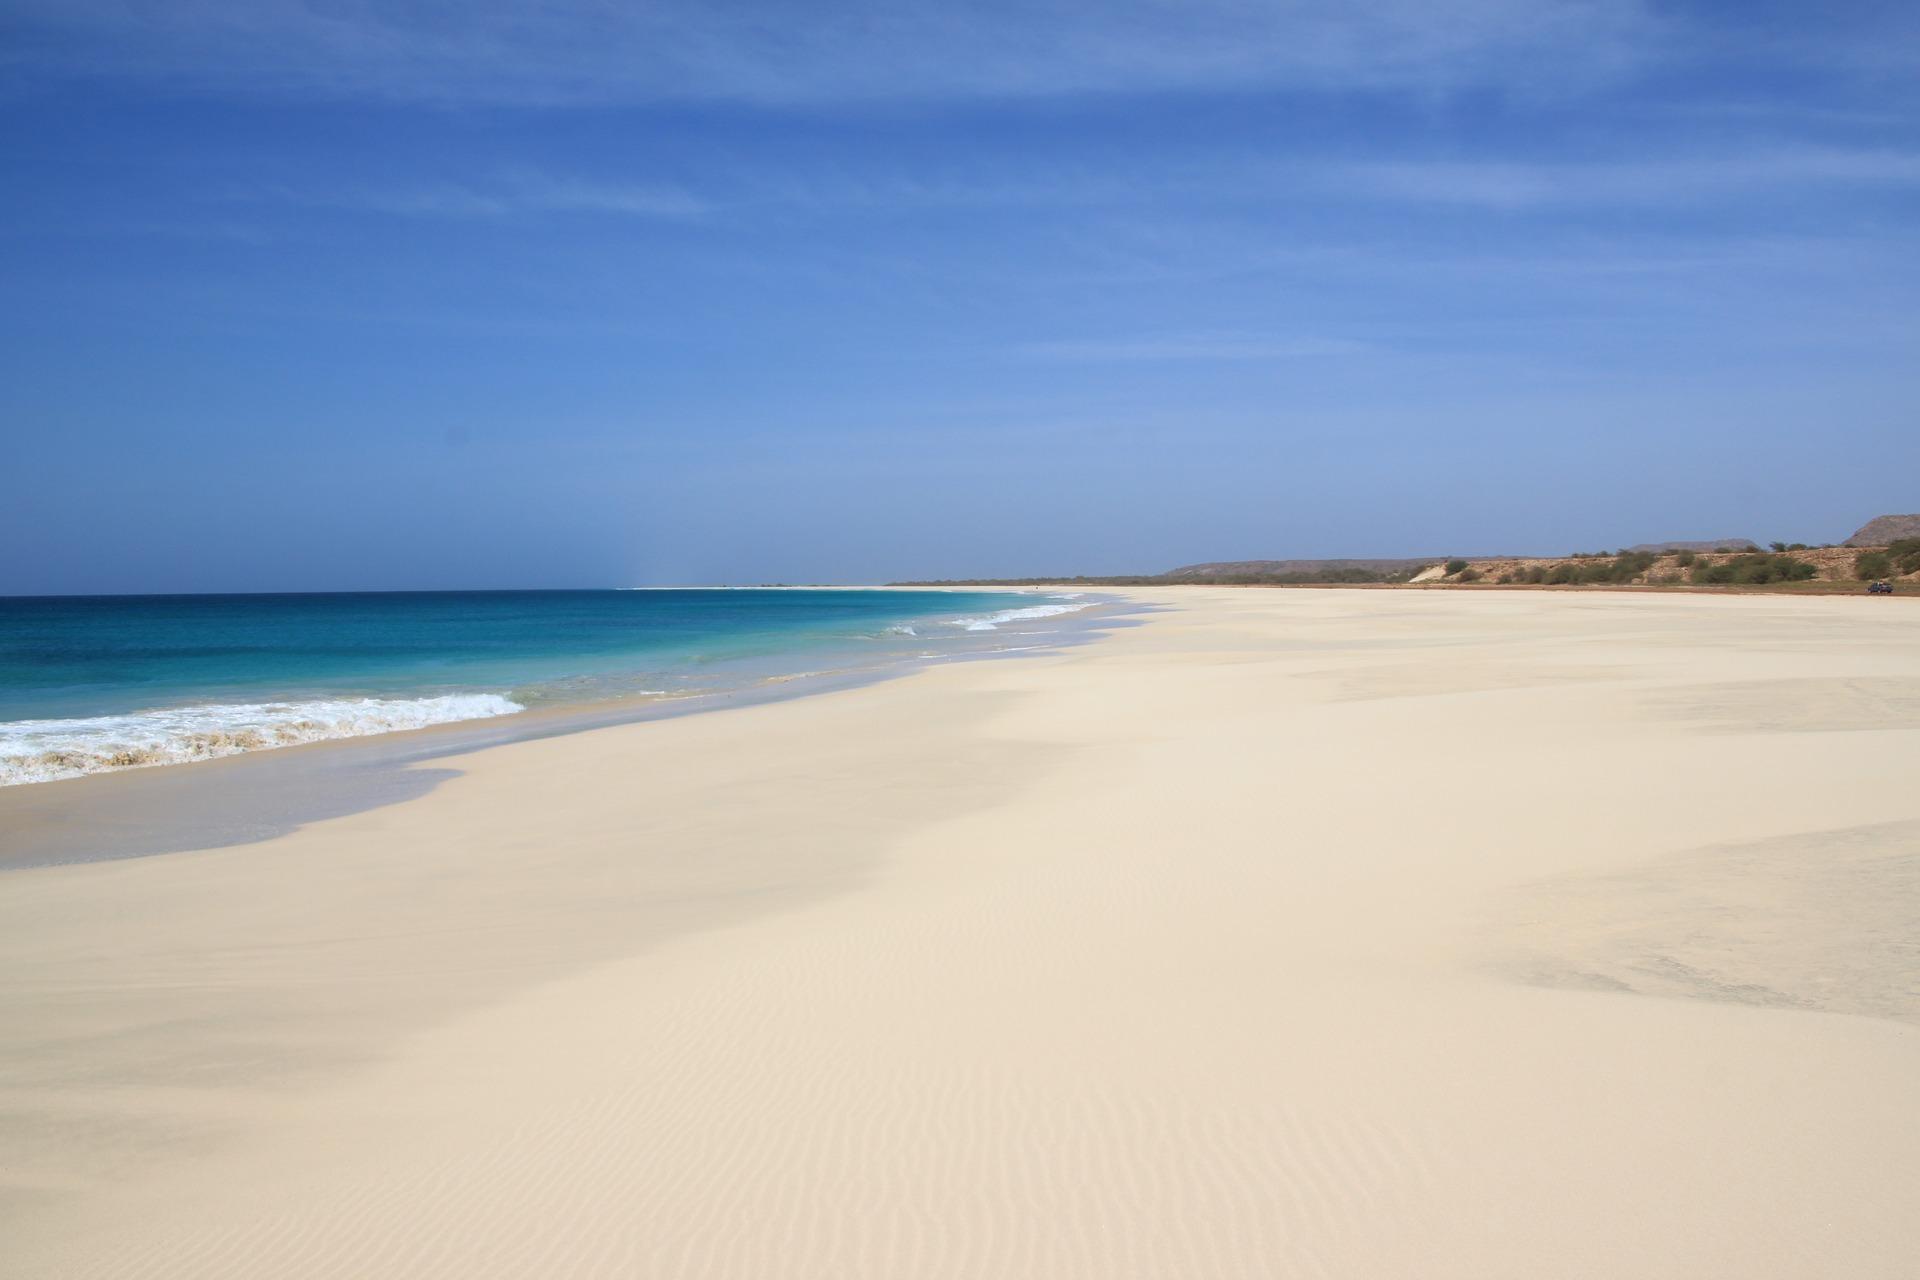 capo verde spiagge meno ventose